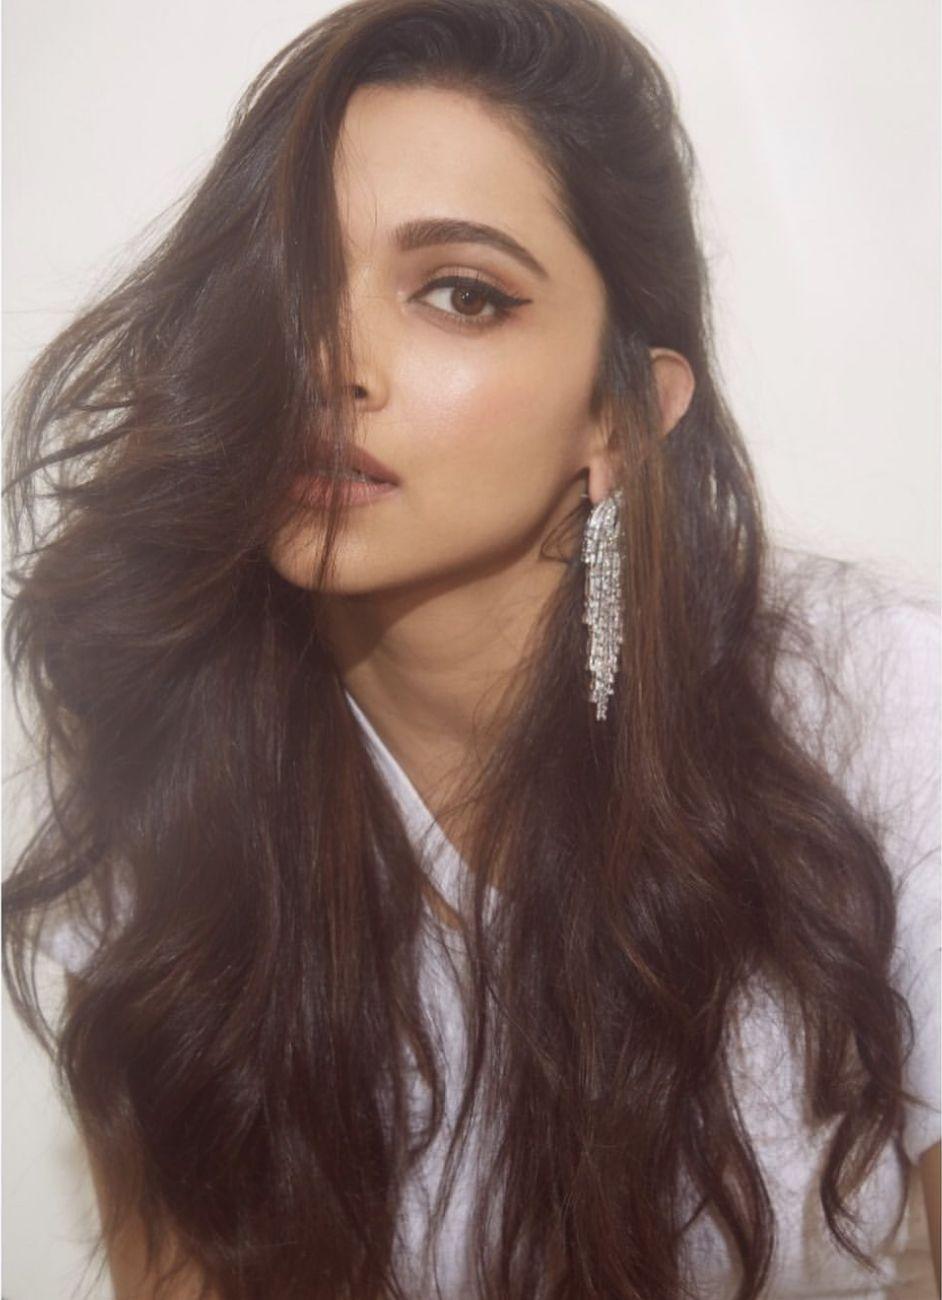 Deepika Padukone Biography Age Height Net Worth Family Movies Buzzzfly Deepika Padukone Hair Beauty Deepika Padukone